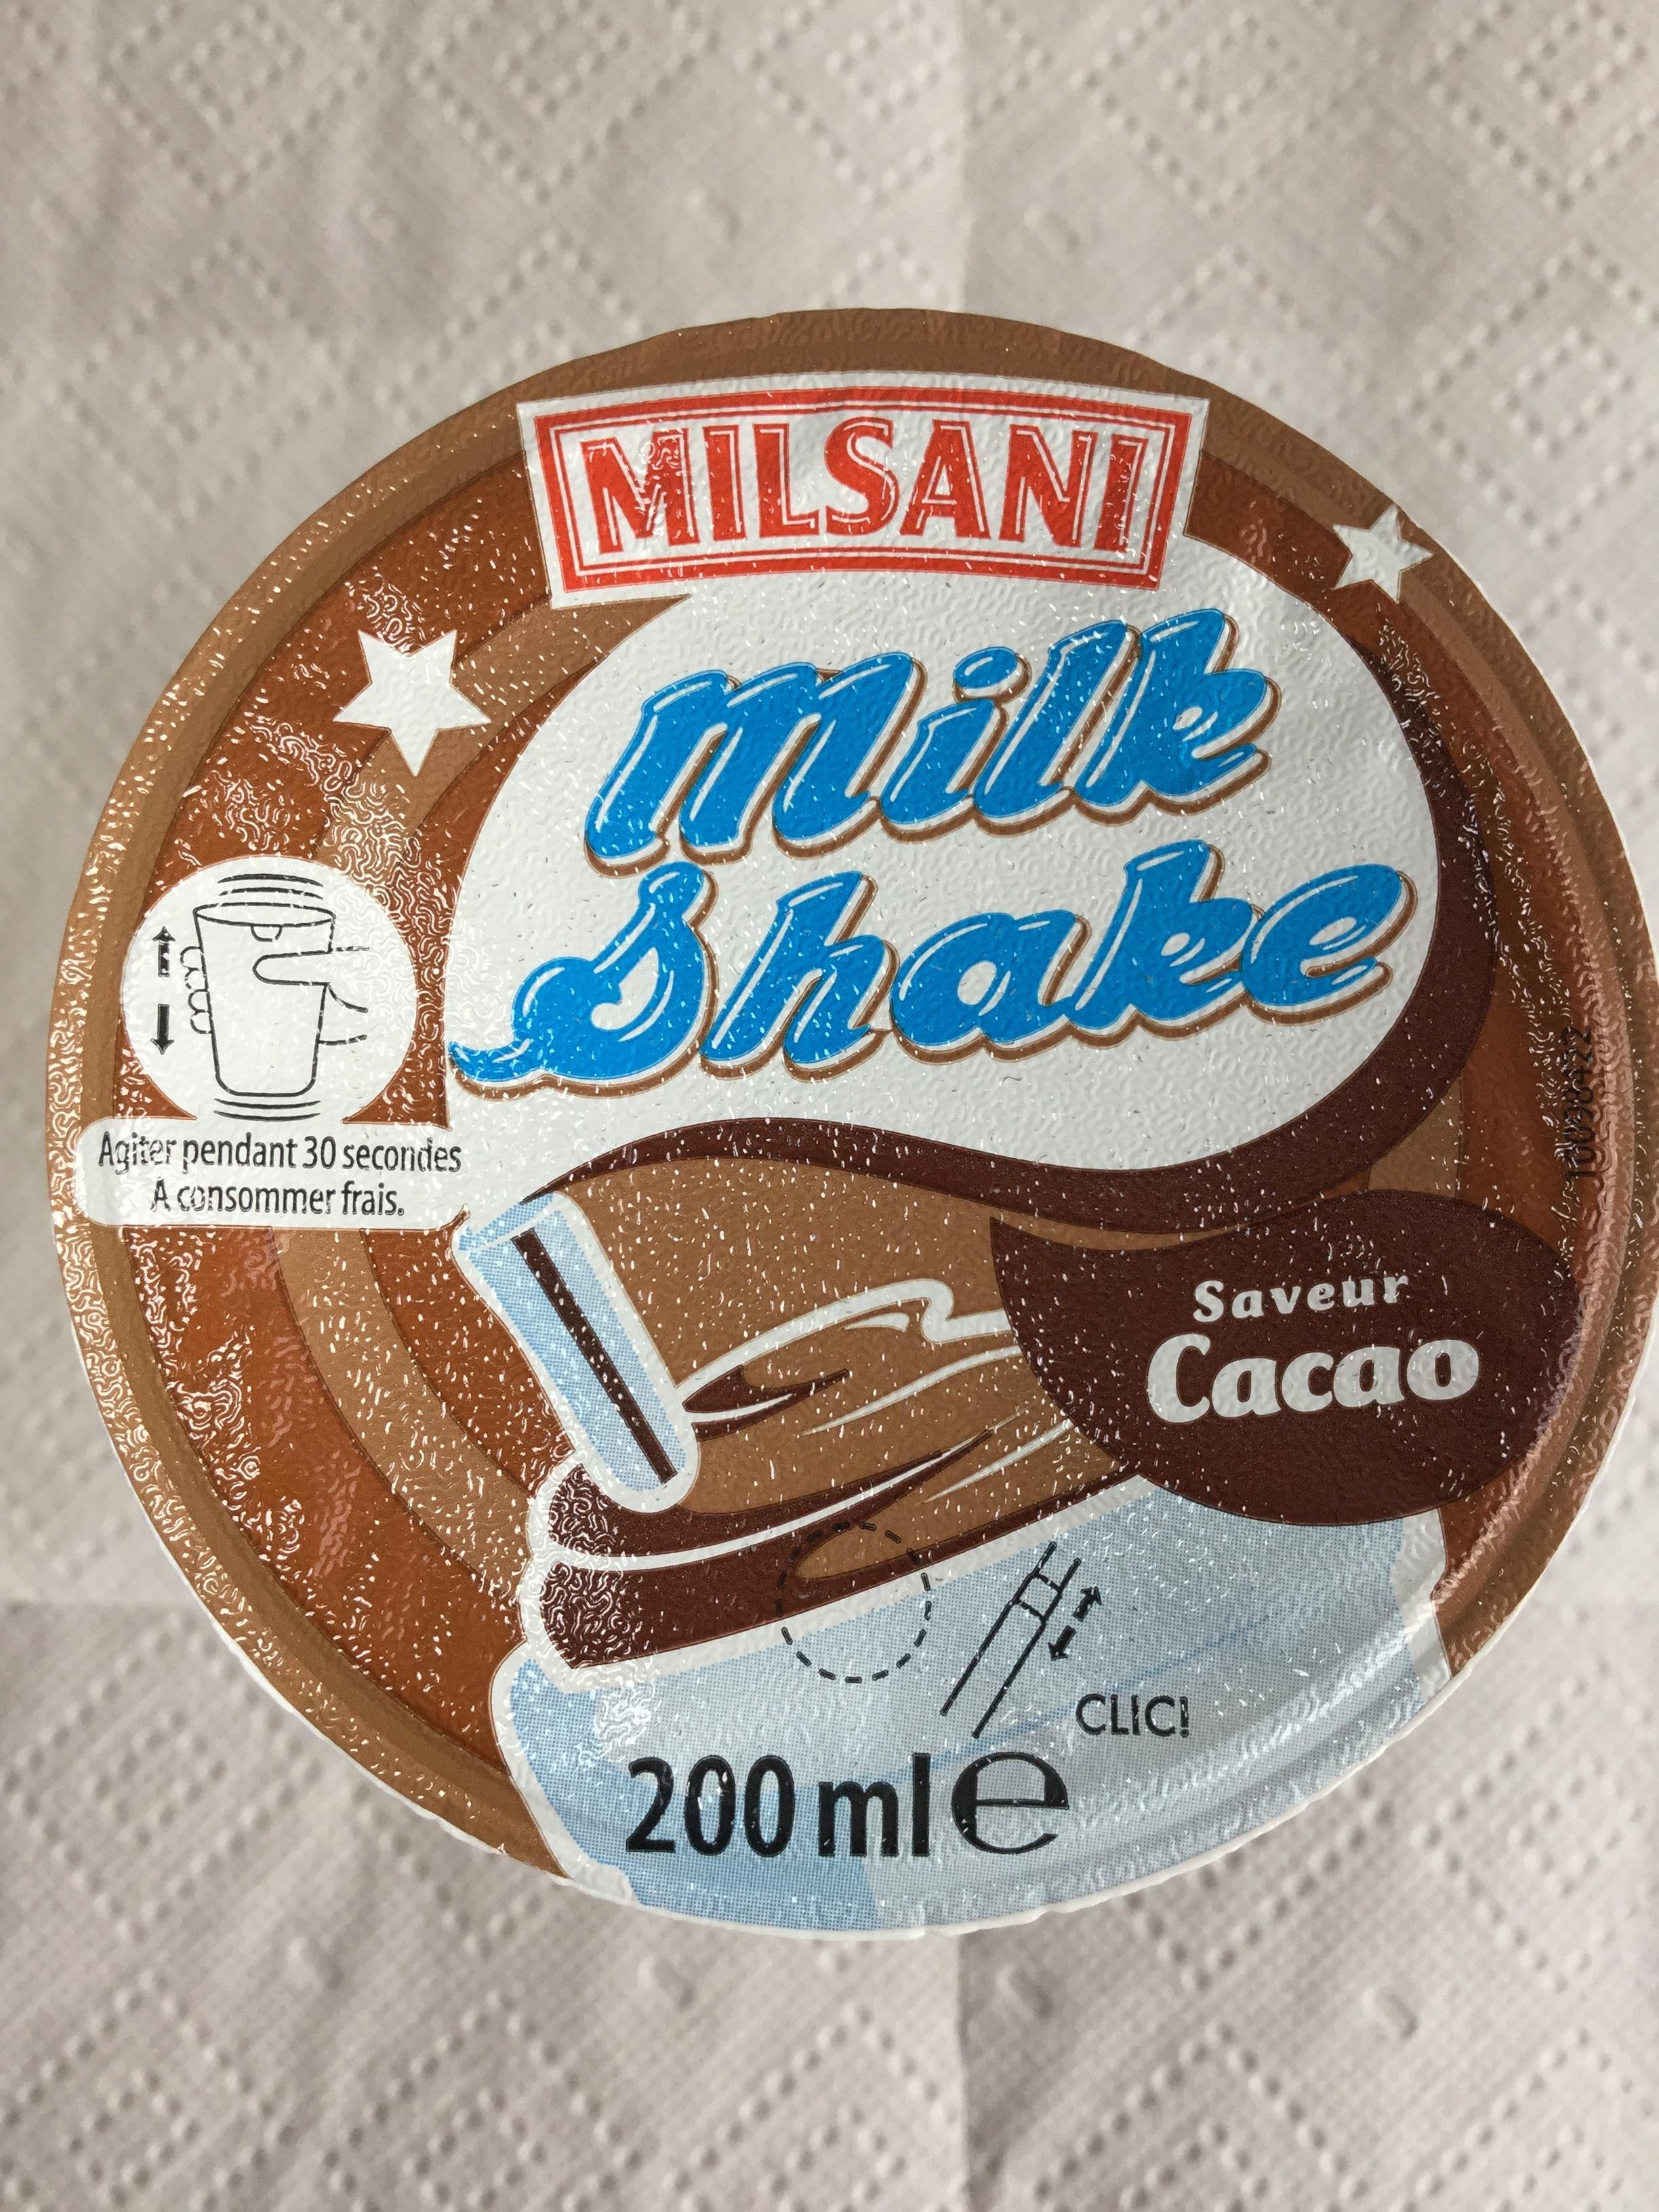 Milsani Milk Shake Saveur Cacao Side 3